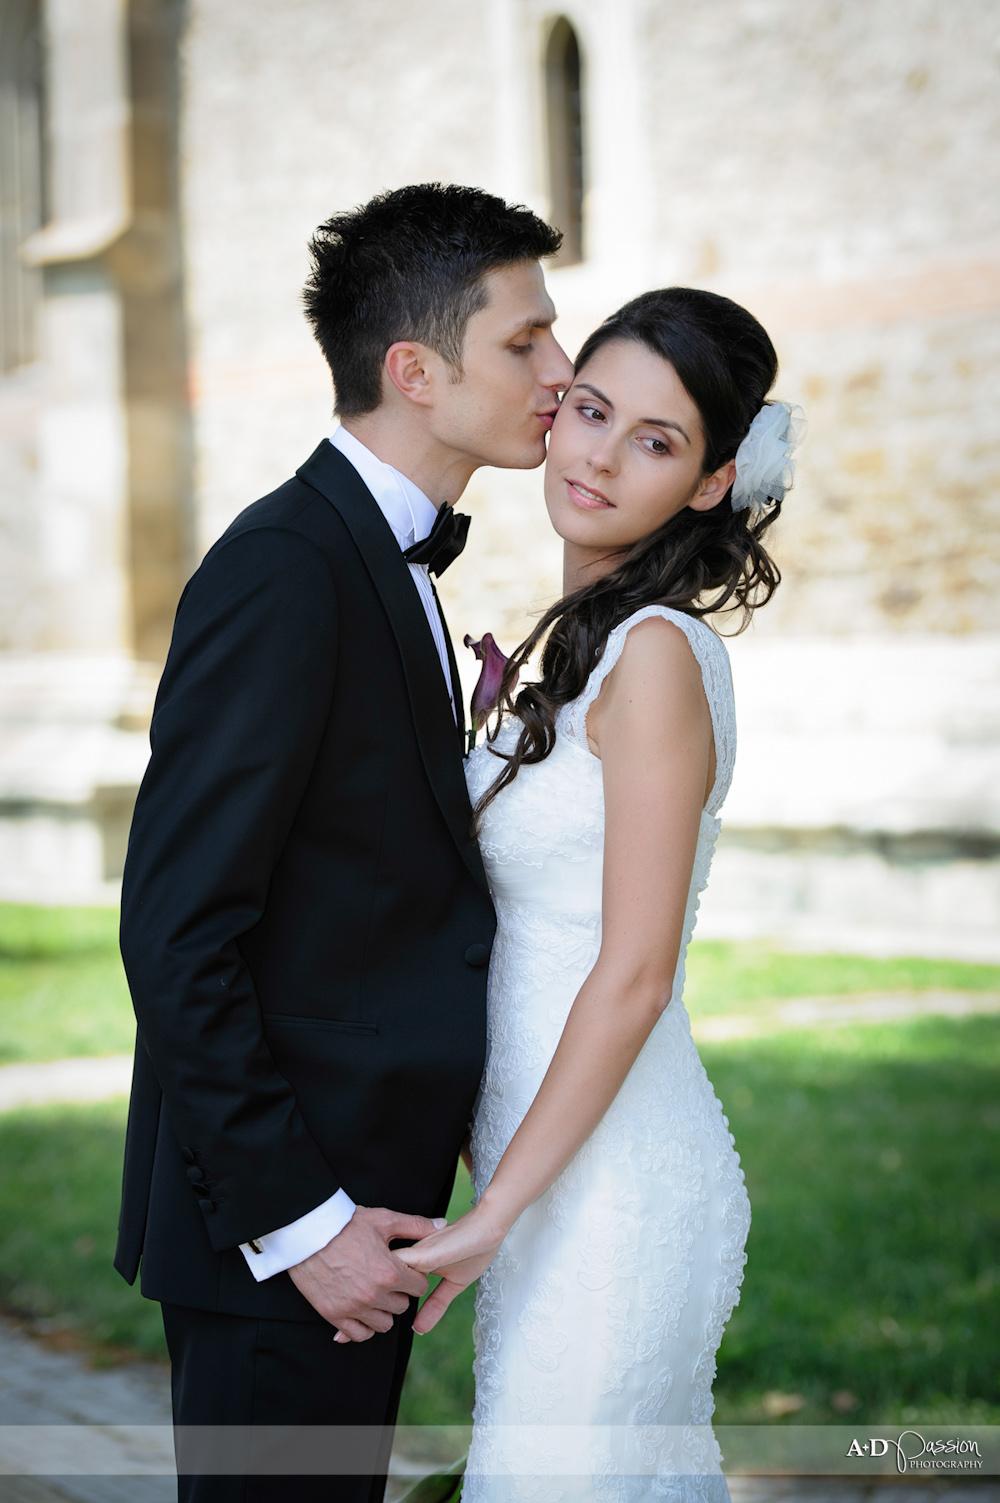 AD Passion Photography | fotograf-profesionist-nunta-piatra-neamt-lavinia-si-mihai_0052 | Adelin, Dida, fotograf profesionist, fotograf de nunta, fotografie de nunta, fotograf Timisoara, fotograf Craiova, fotograf Bucuresti, fotograf Arad, nunta Timisoara, nunta Arad, nunta Bucuresti, nunta Craiova